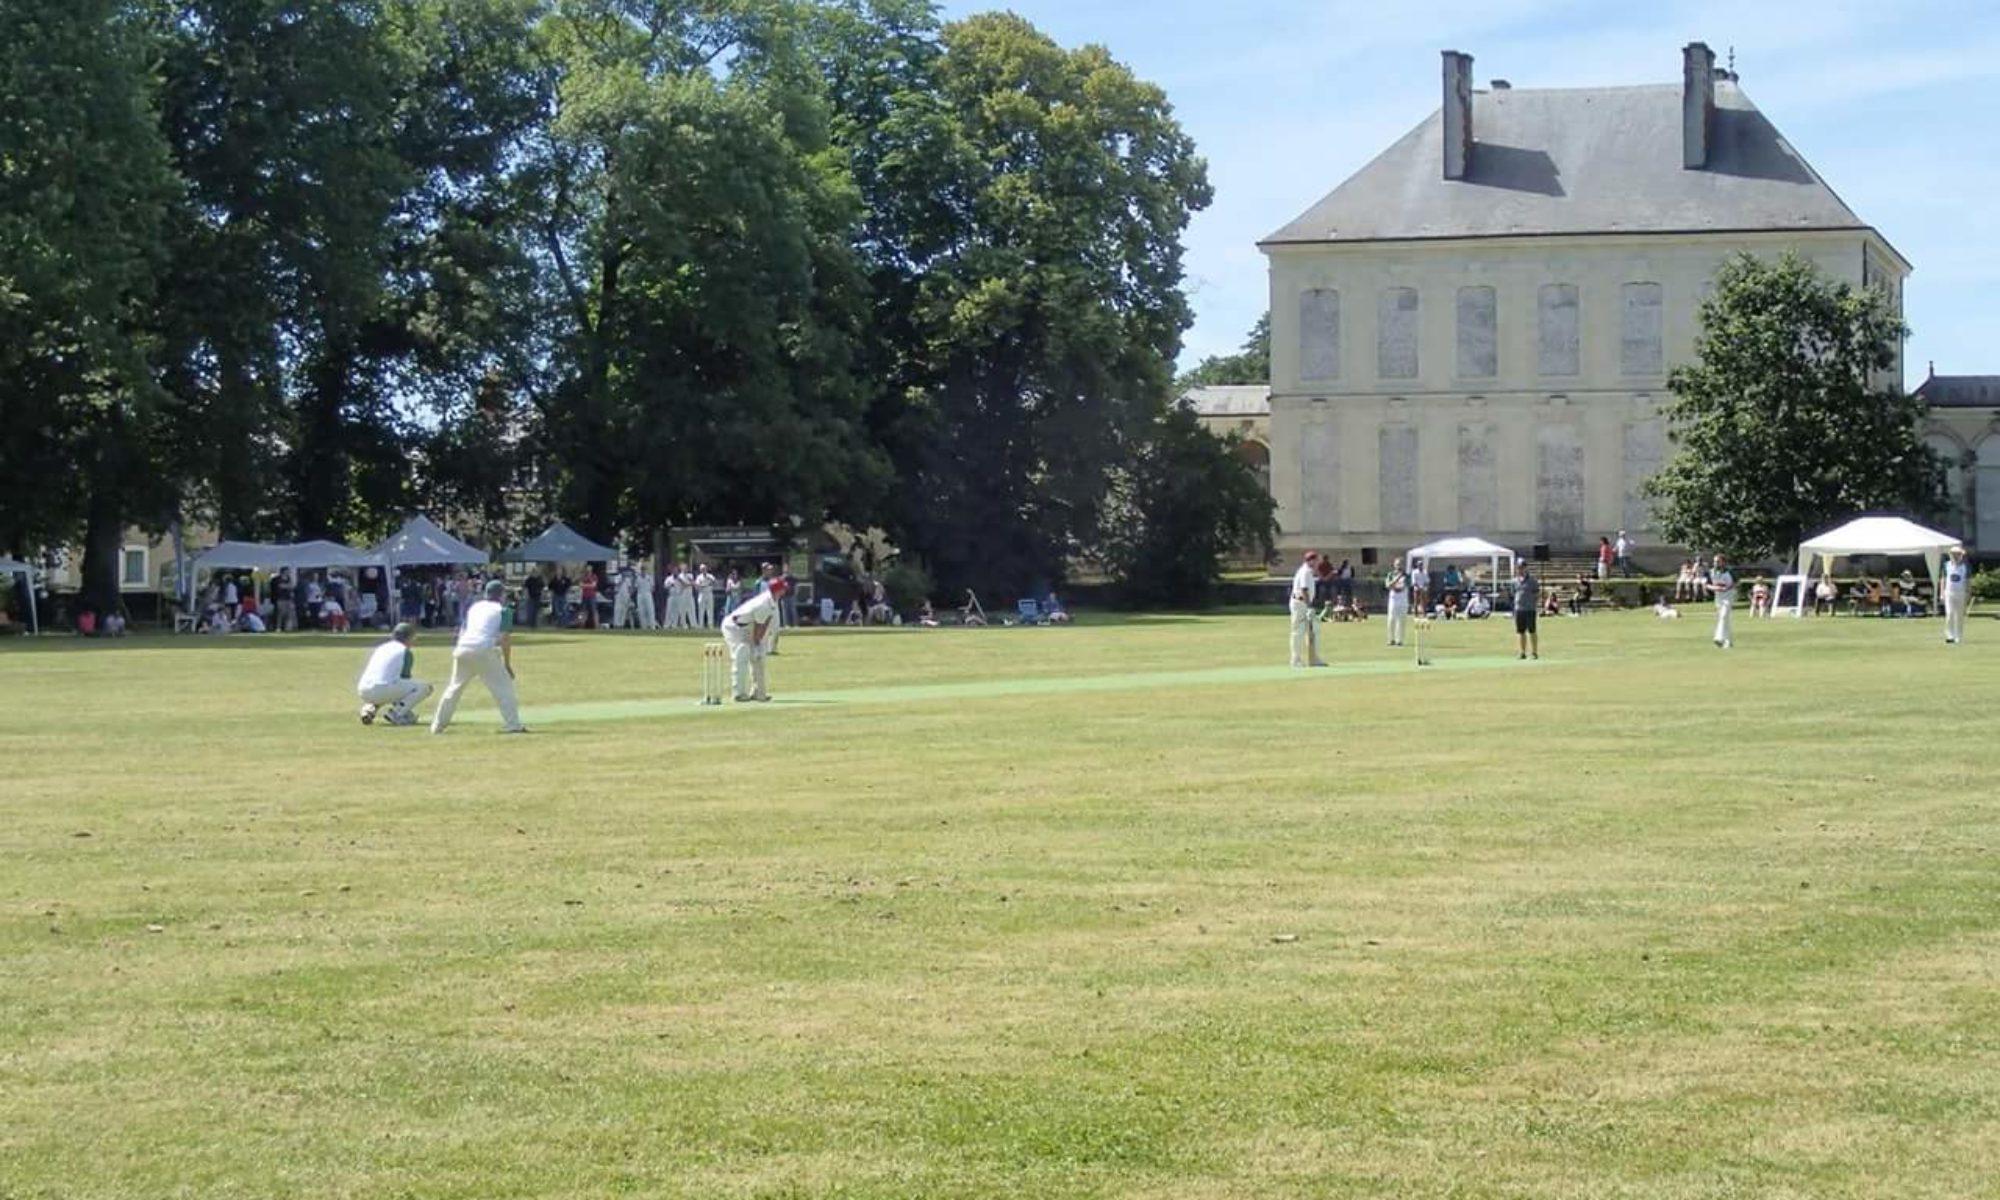 Nantes Cricket Club